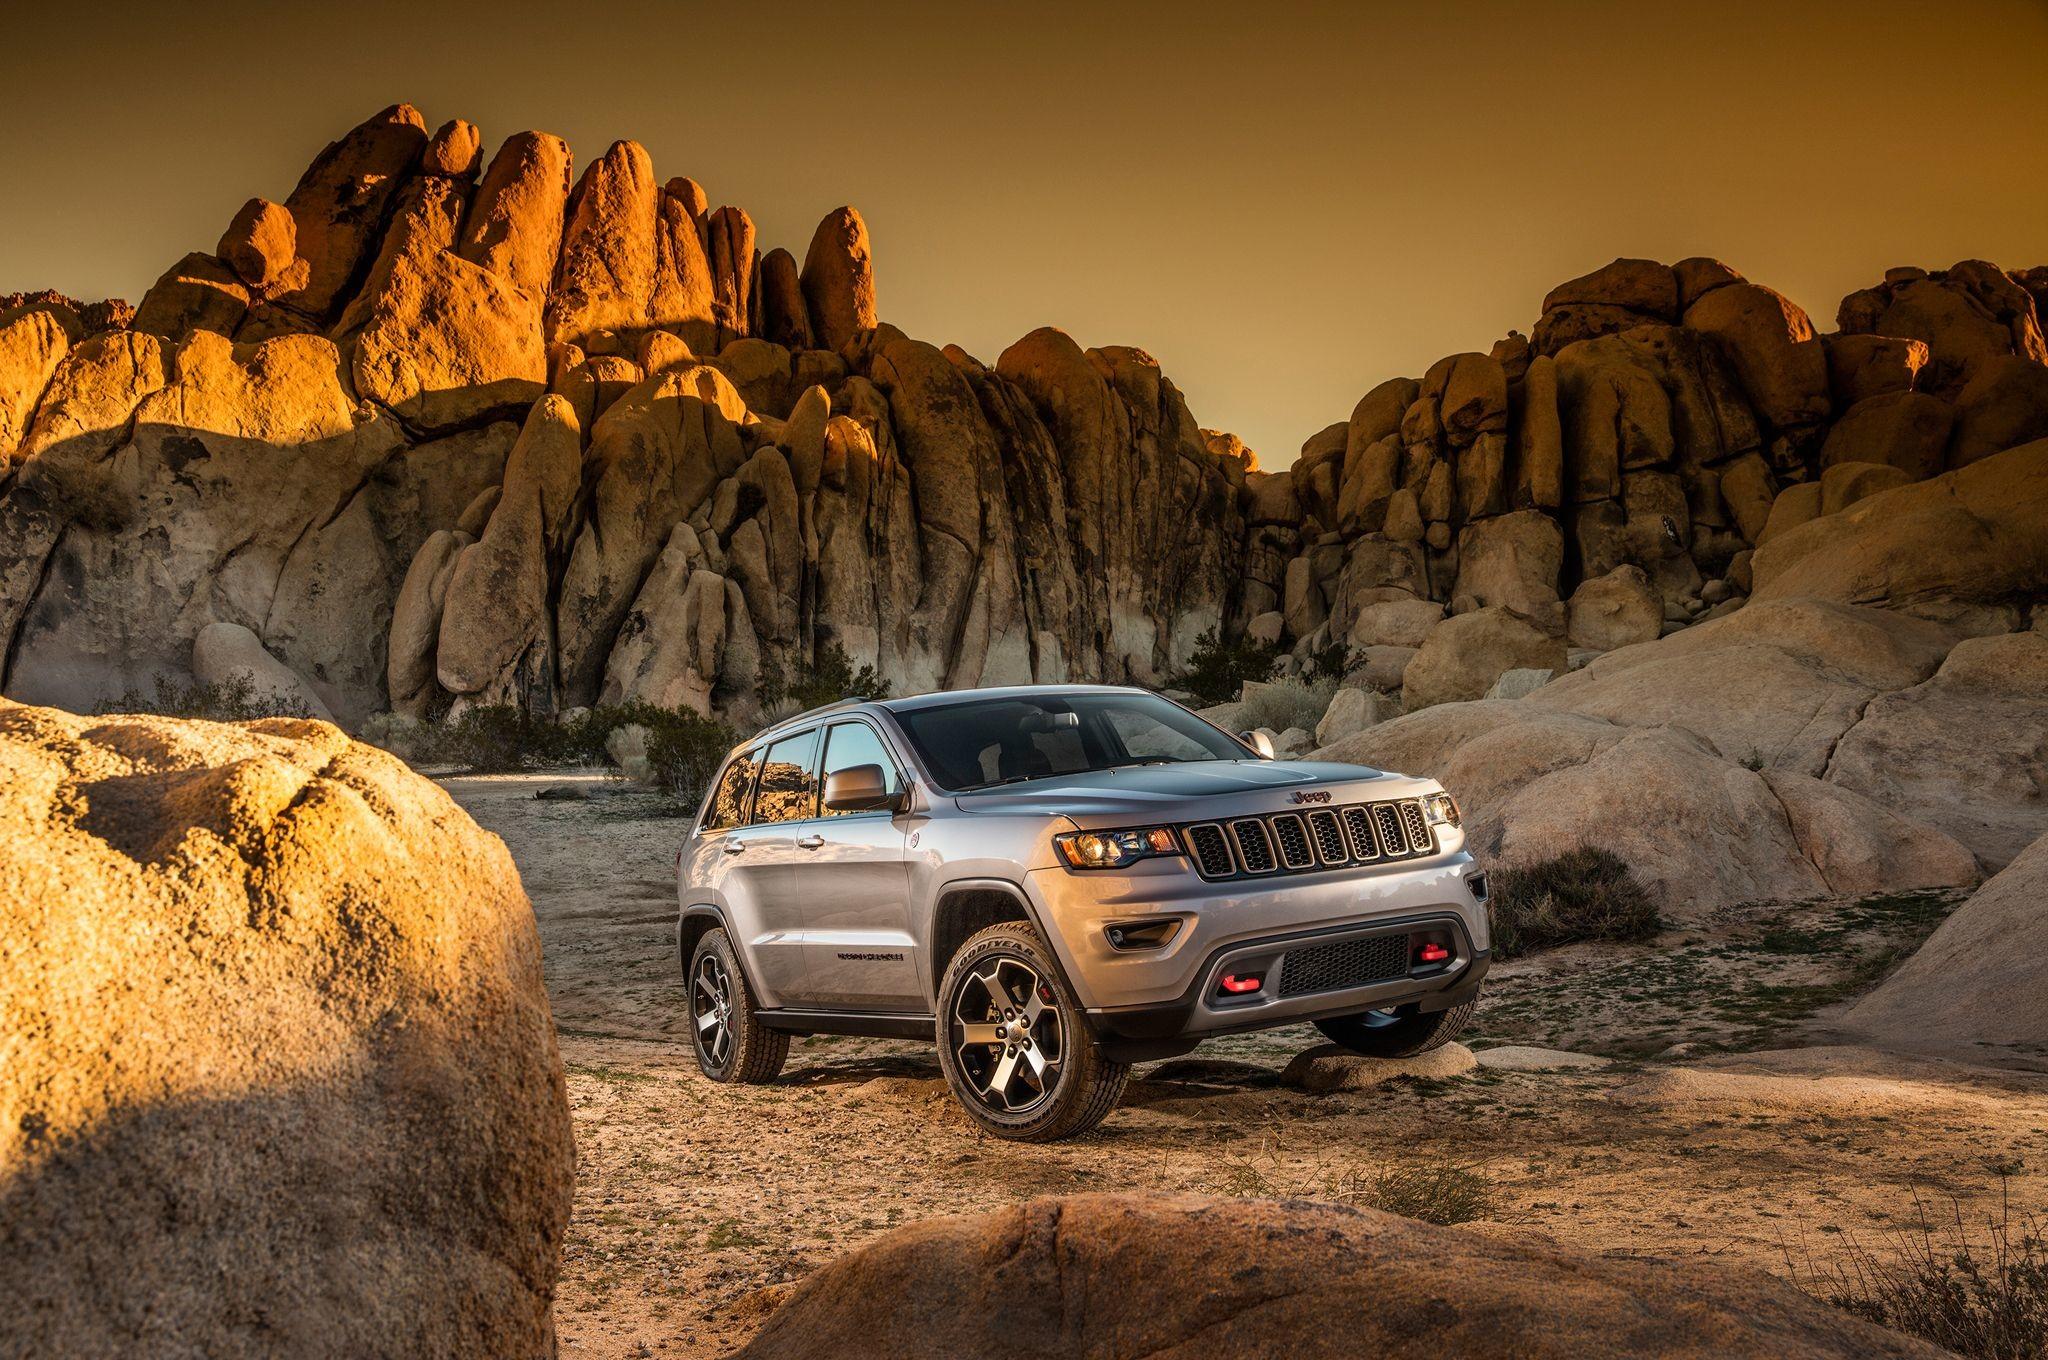 2017 Jeep Grand Cherokee Trailhawk Front Three Quarter